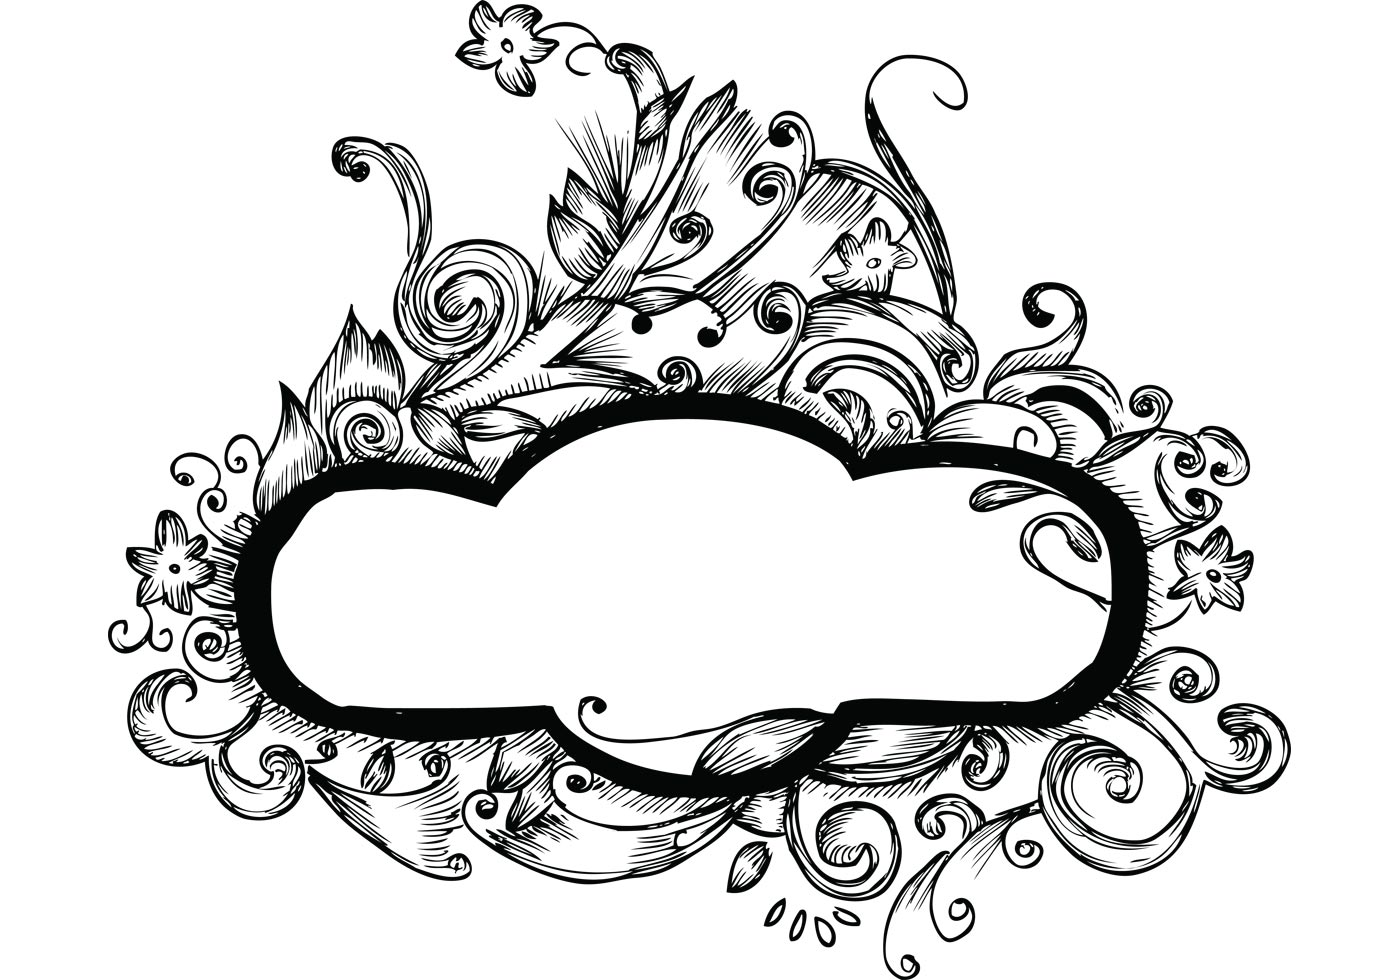 Hand drawn floral frames free vector designs download for Frame designs